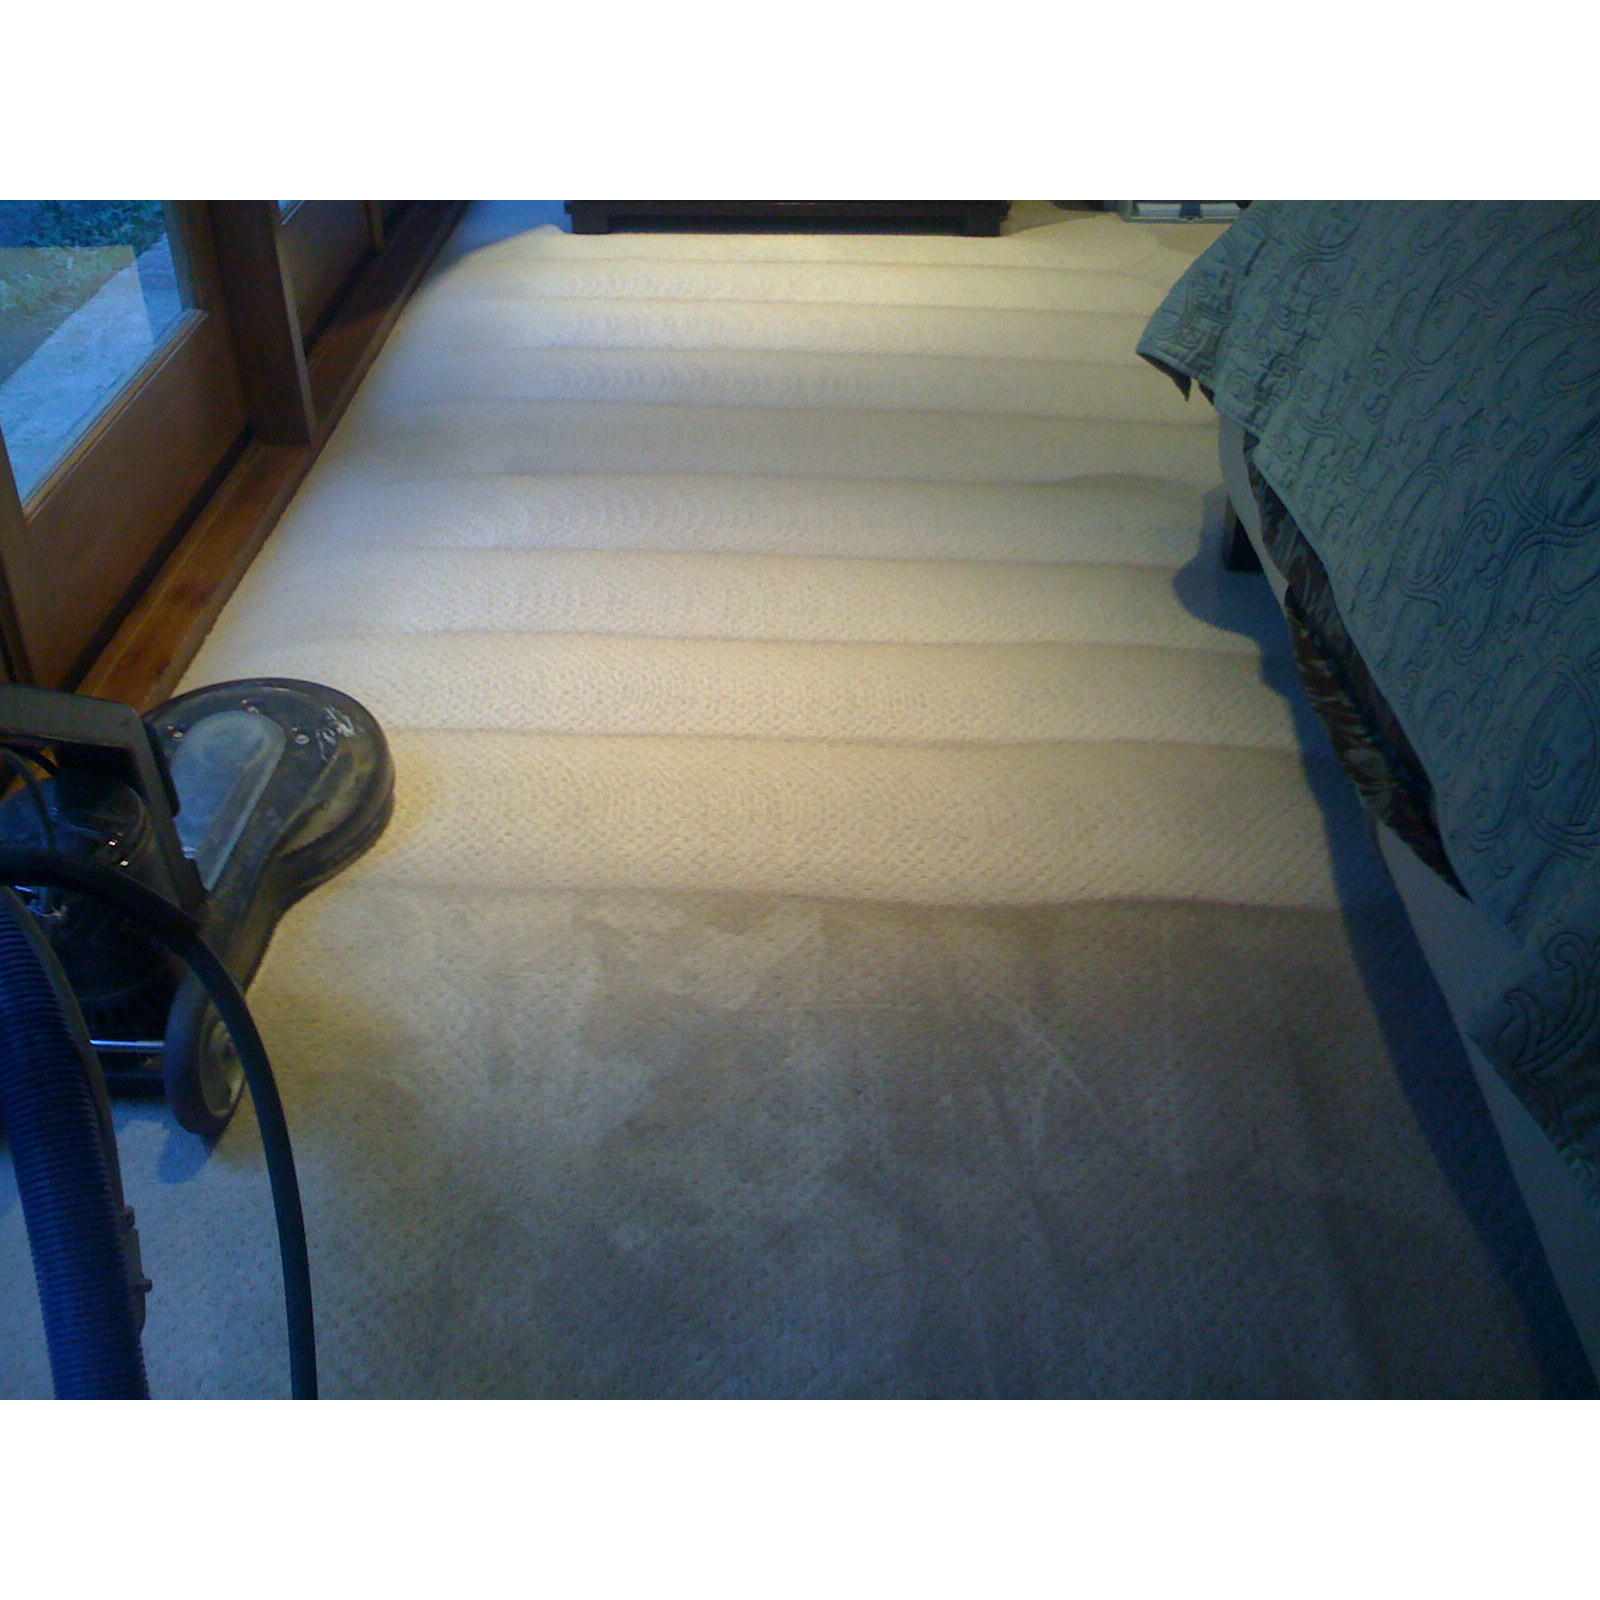 JP Carpet Cleaning Expert Floor Care